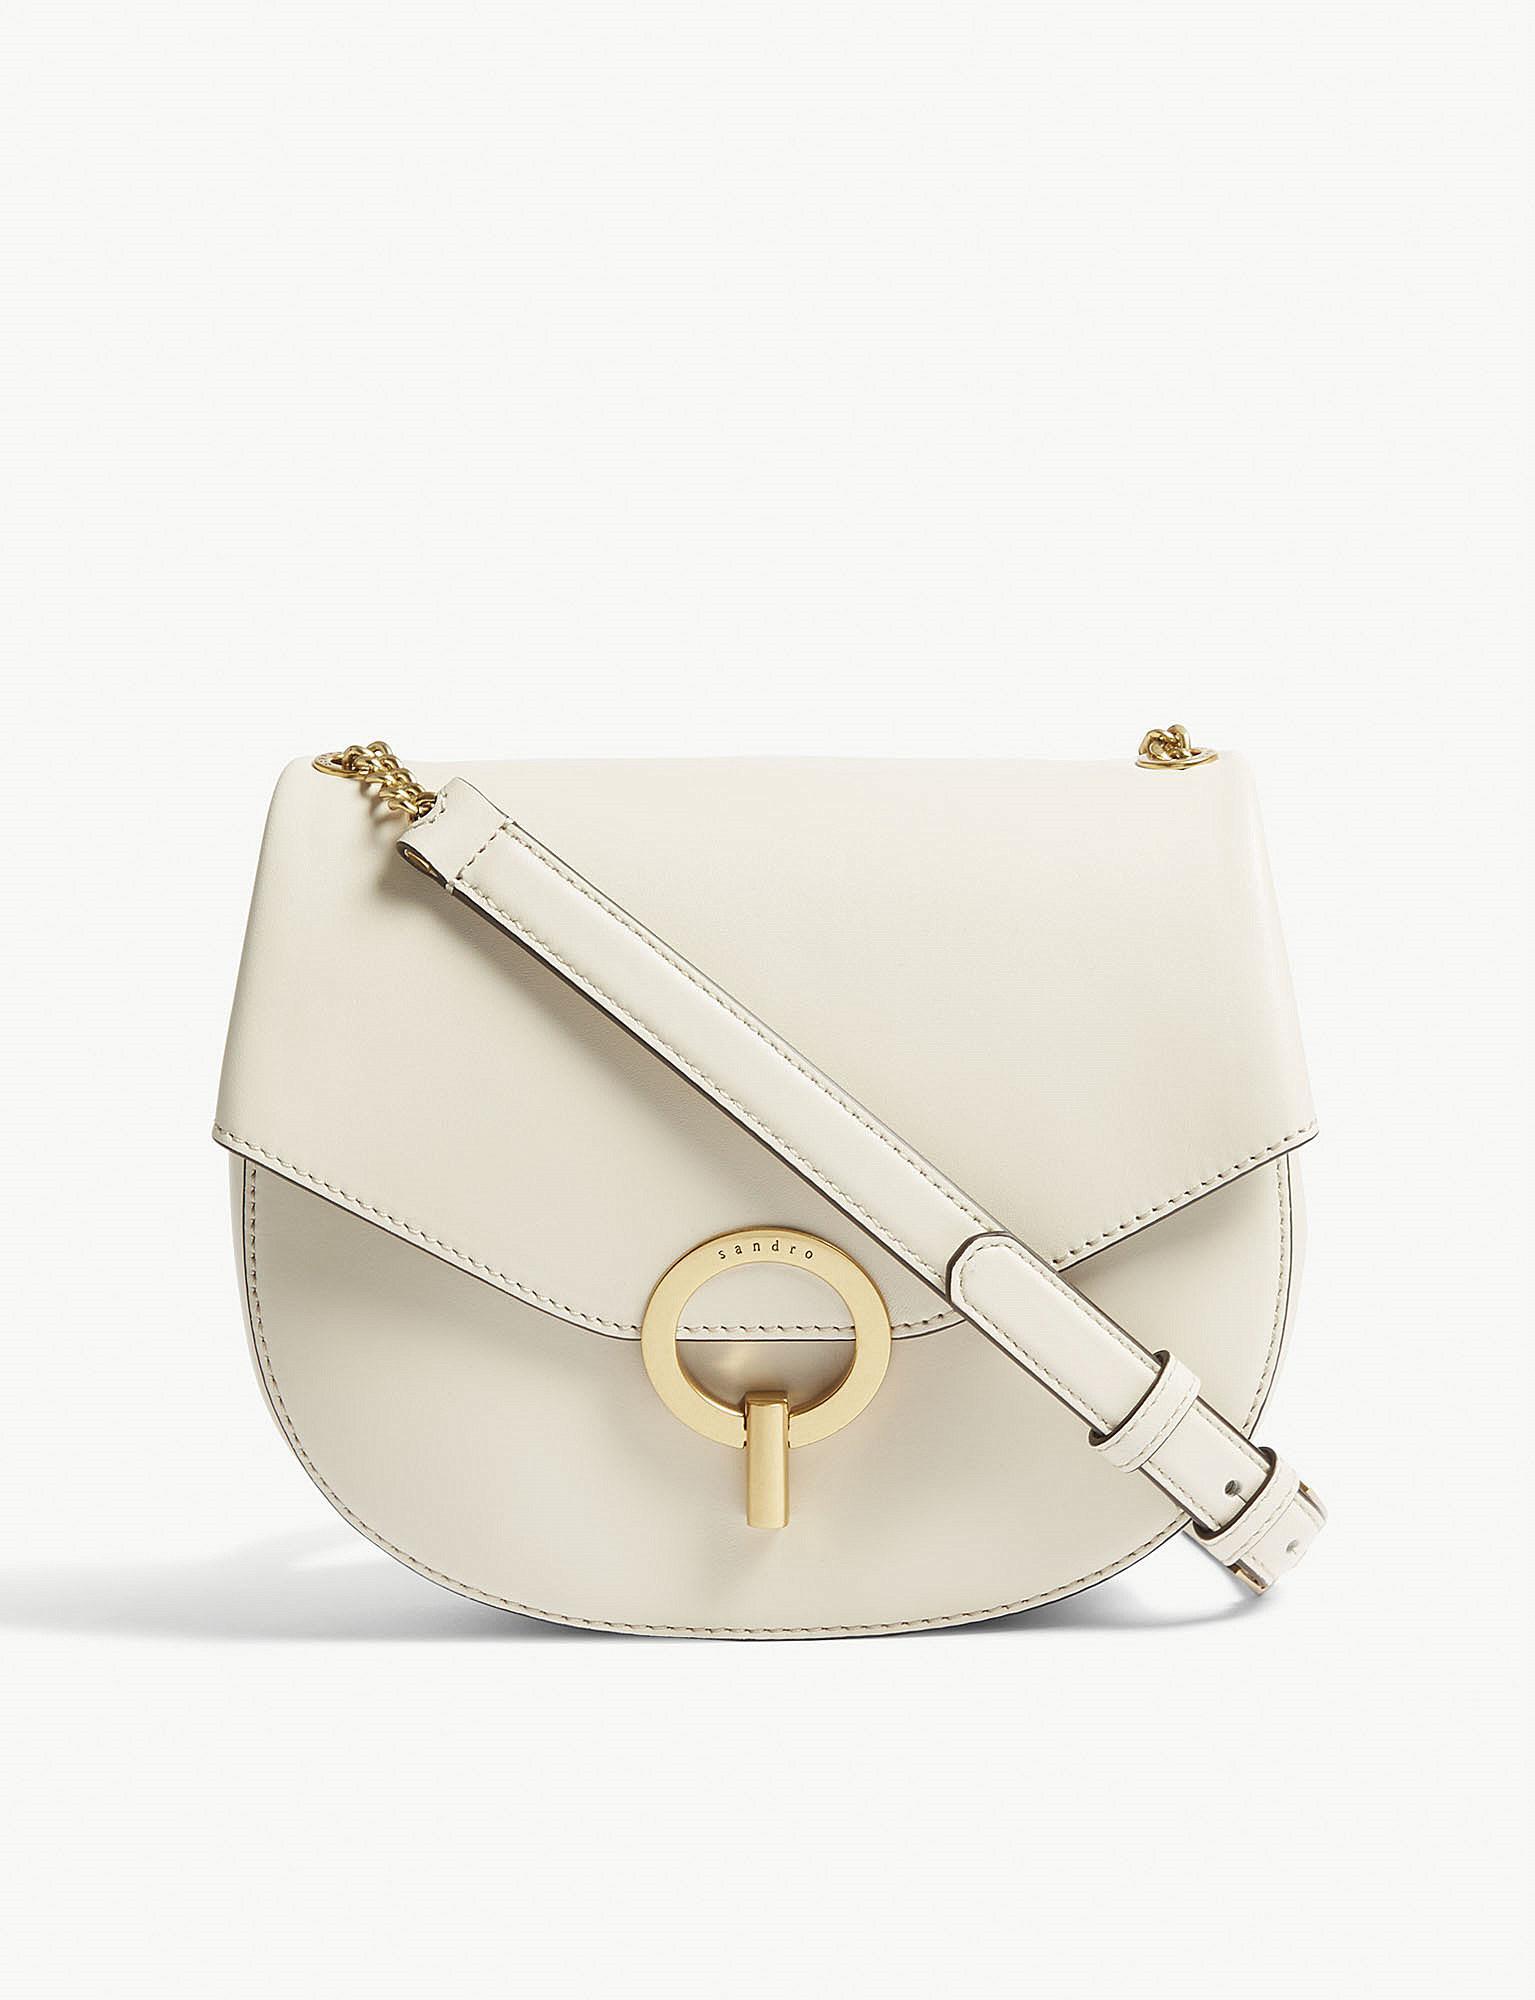 584df26e6e09 Sandro Pepita Leather Cross-body Bag in Natural - Lyst